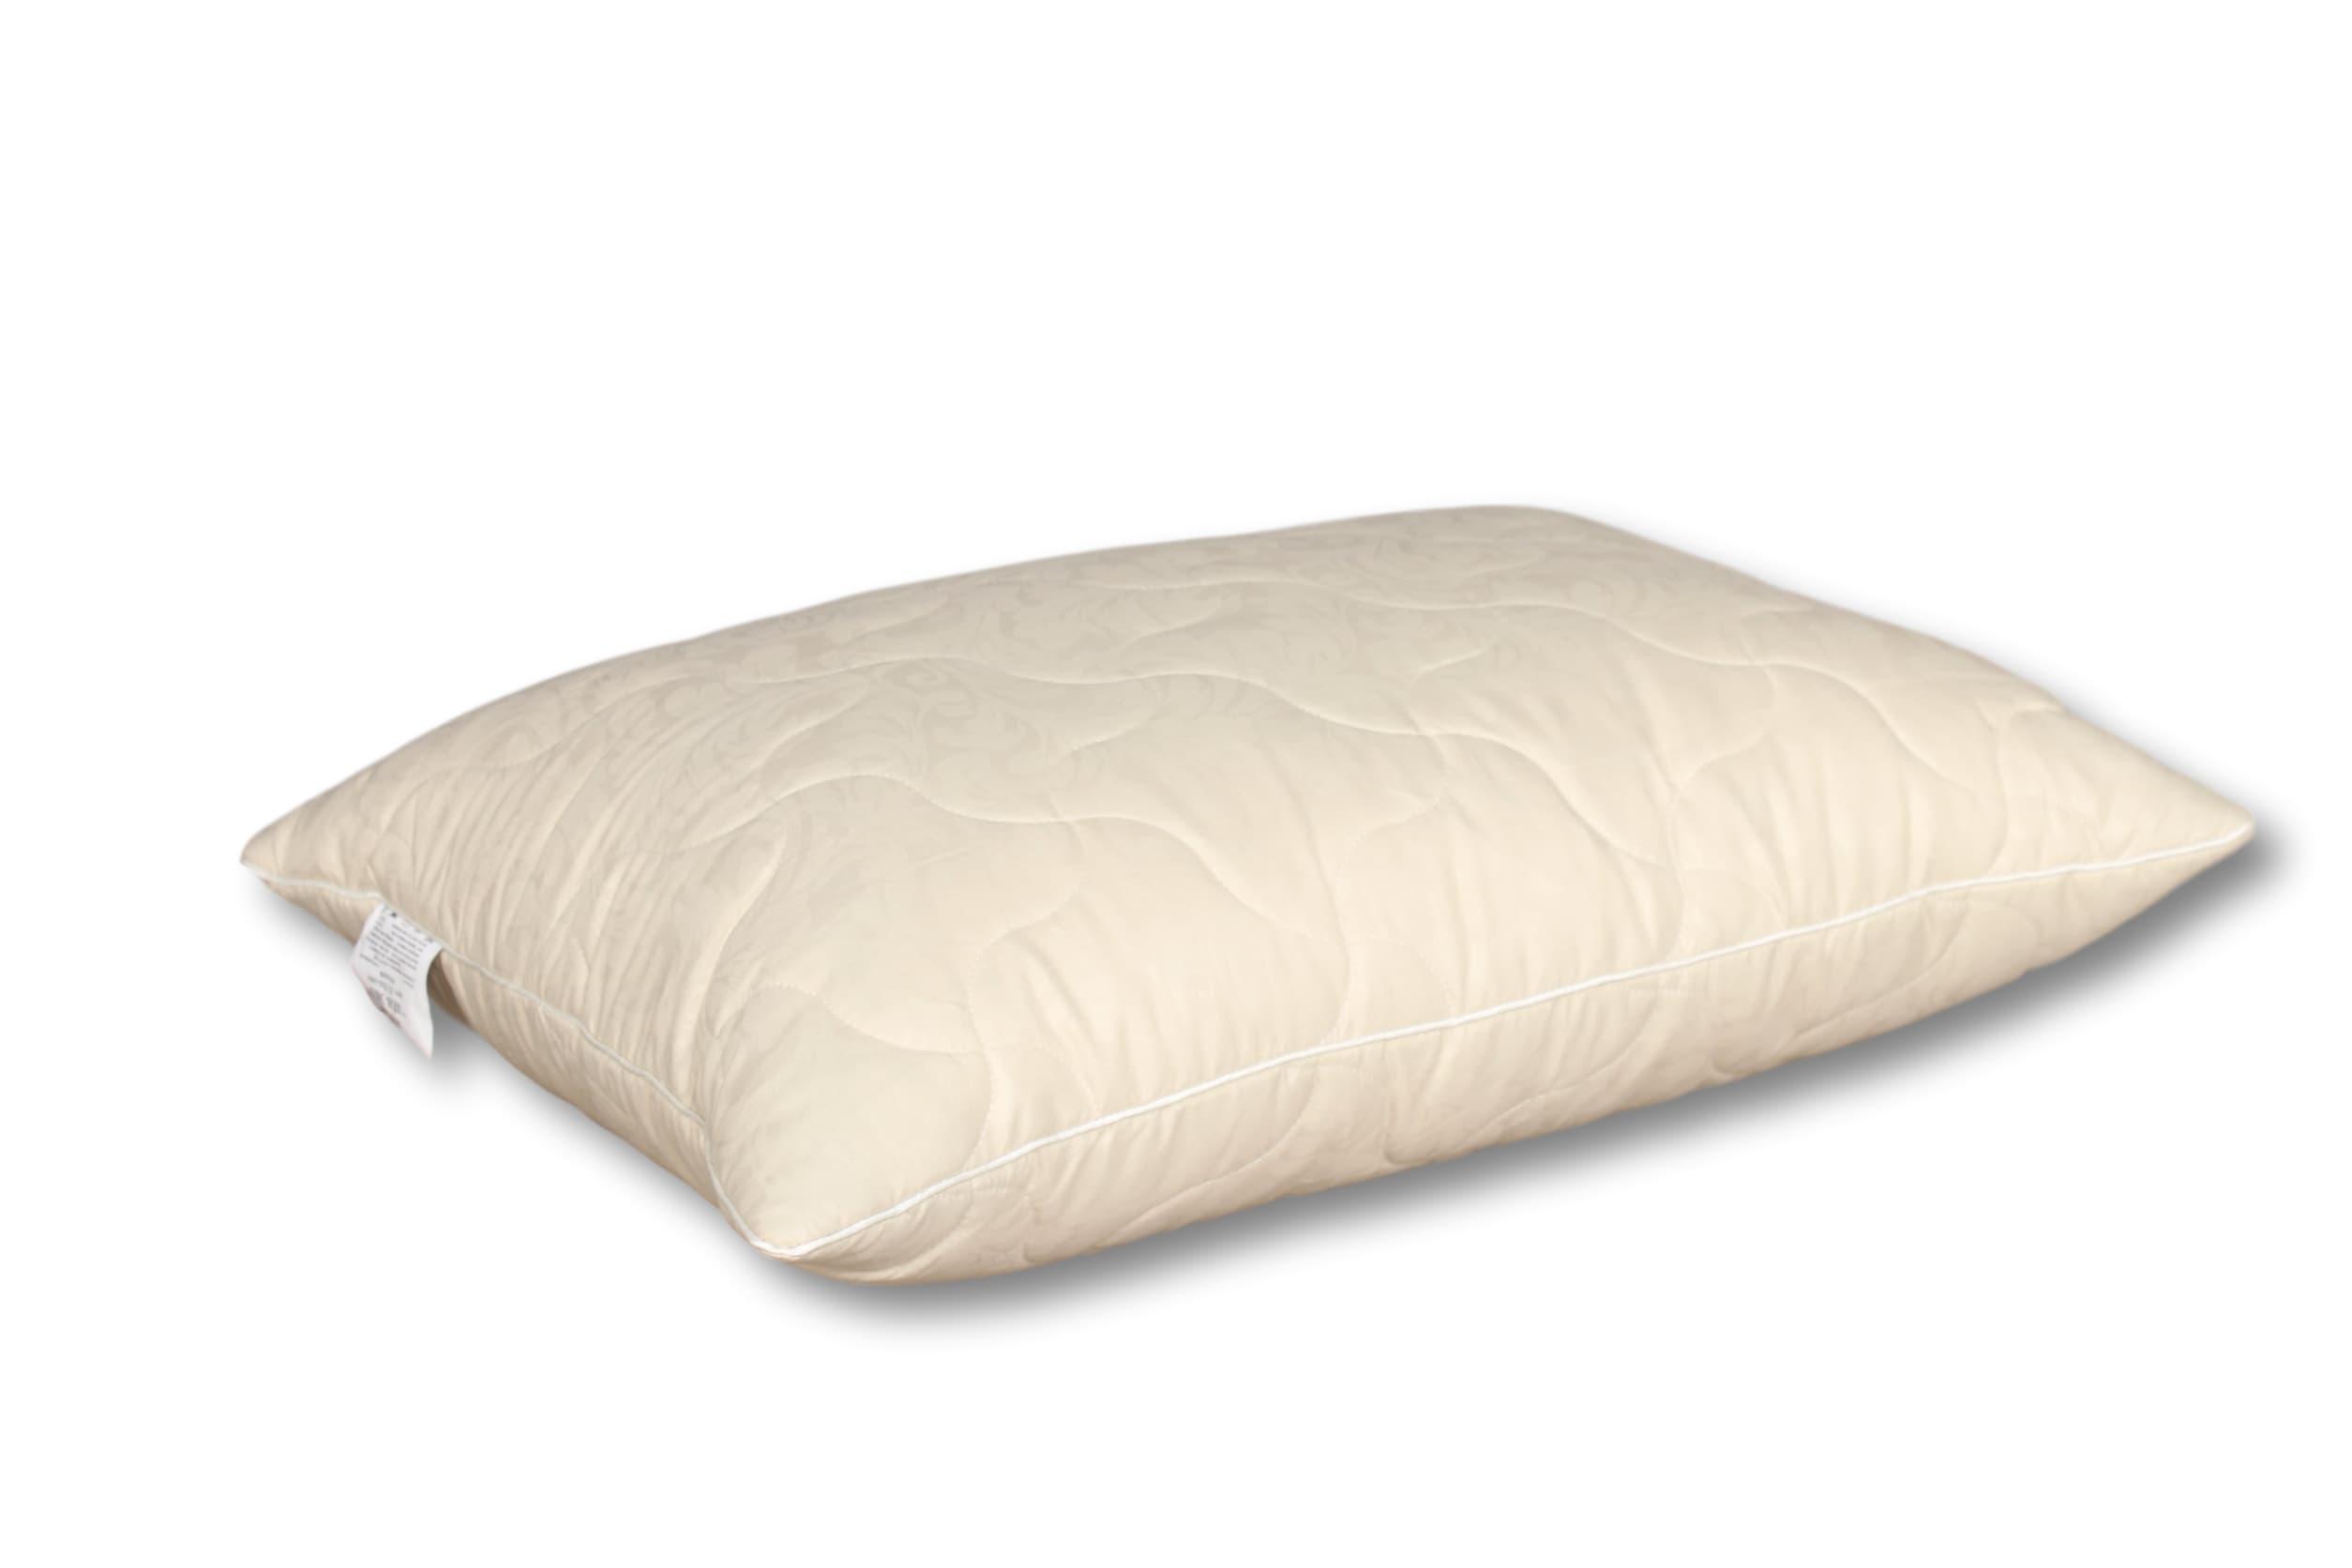 Подушка Лен-Эко Альвитек размер 50 х 70